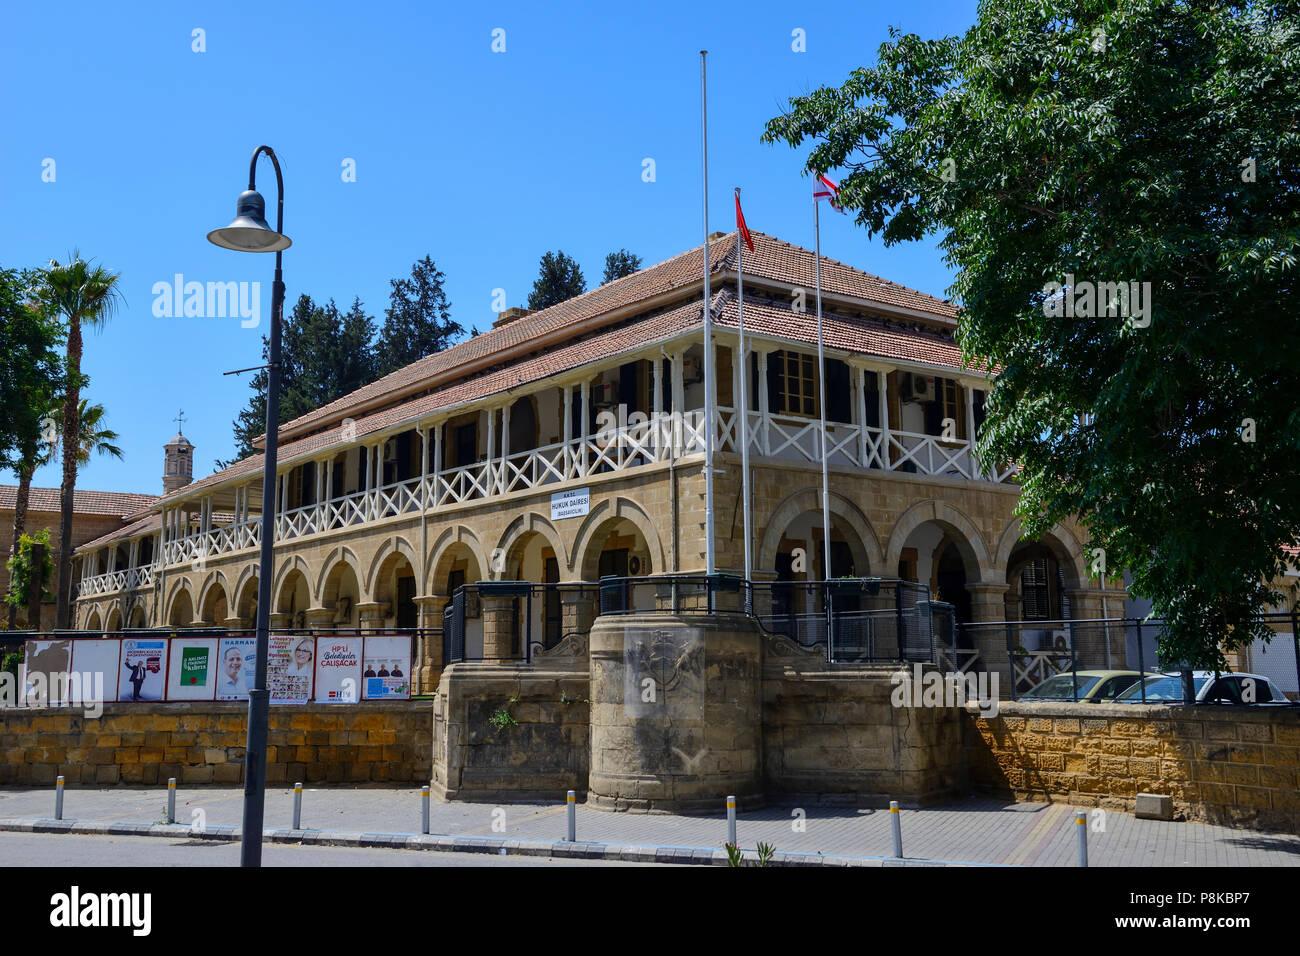 Law Courts on Atatürk Square (Sarayönü Square) in North Nicosia (Lefkosa), Turkish Republic of Northern Cyprus - Stock Image